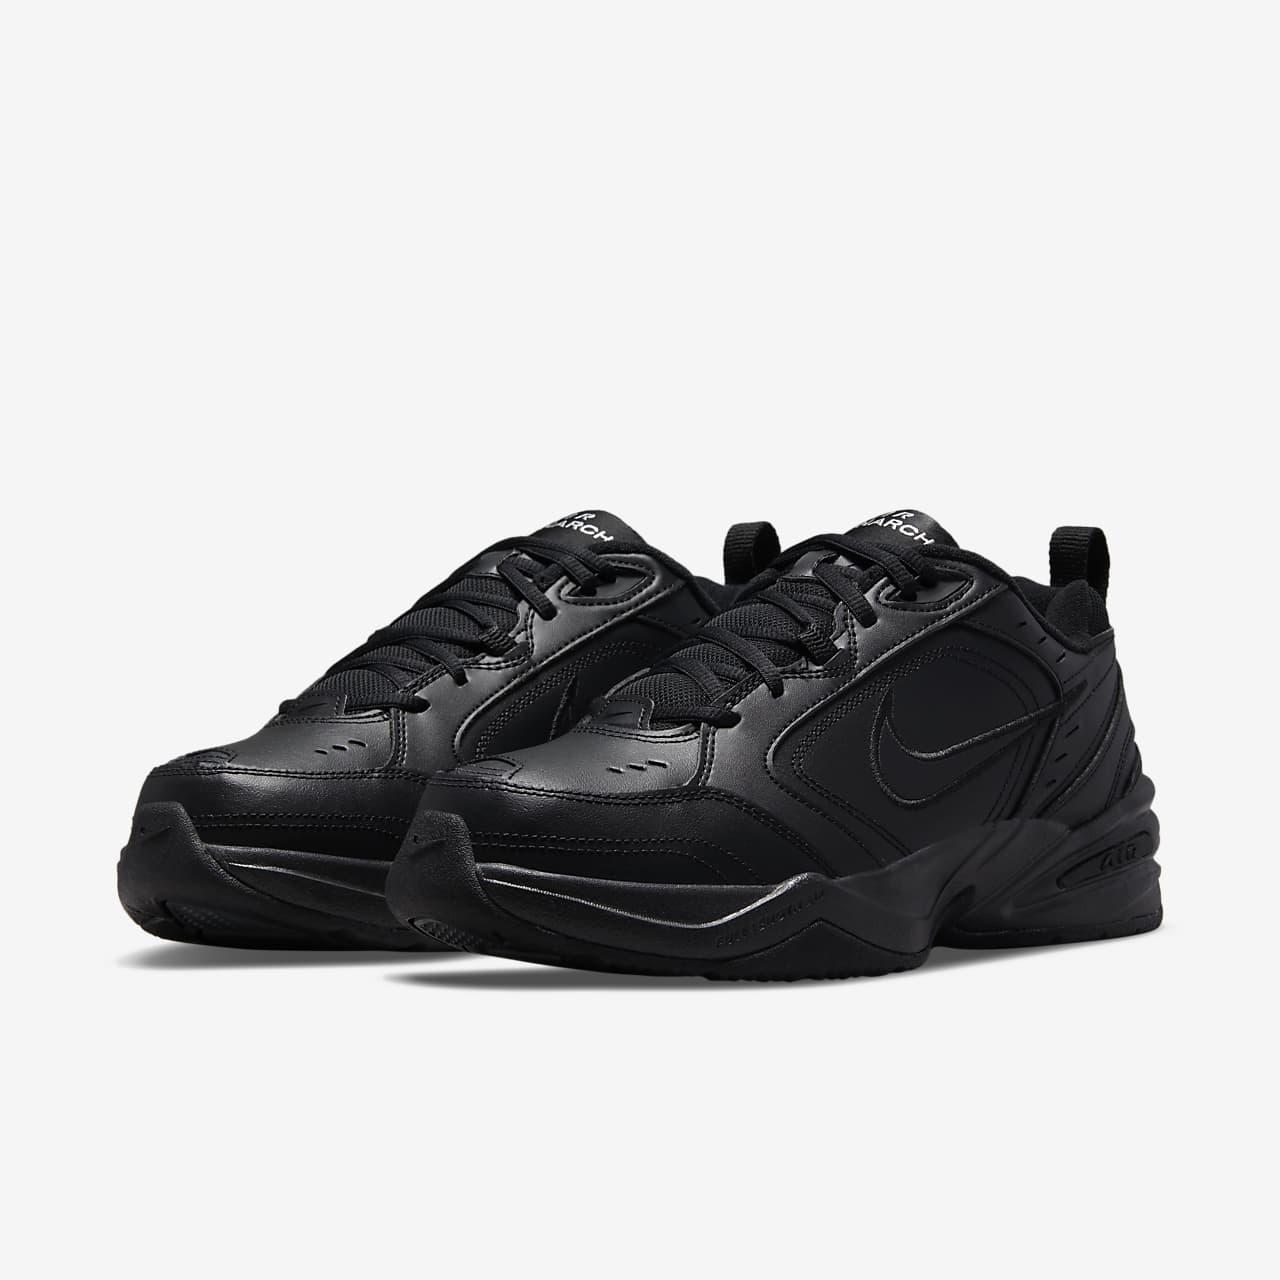 ... Nike Air Monarch IV (Extra Wide) Unisex Training Shoe